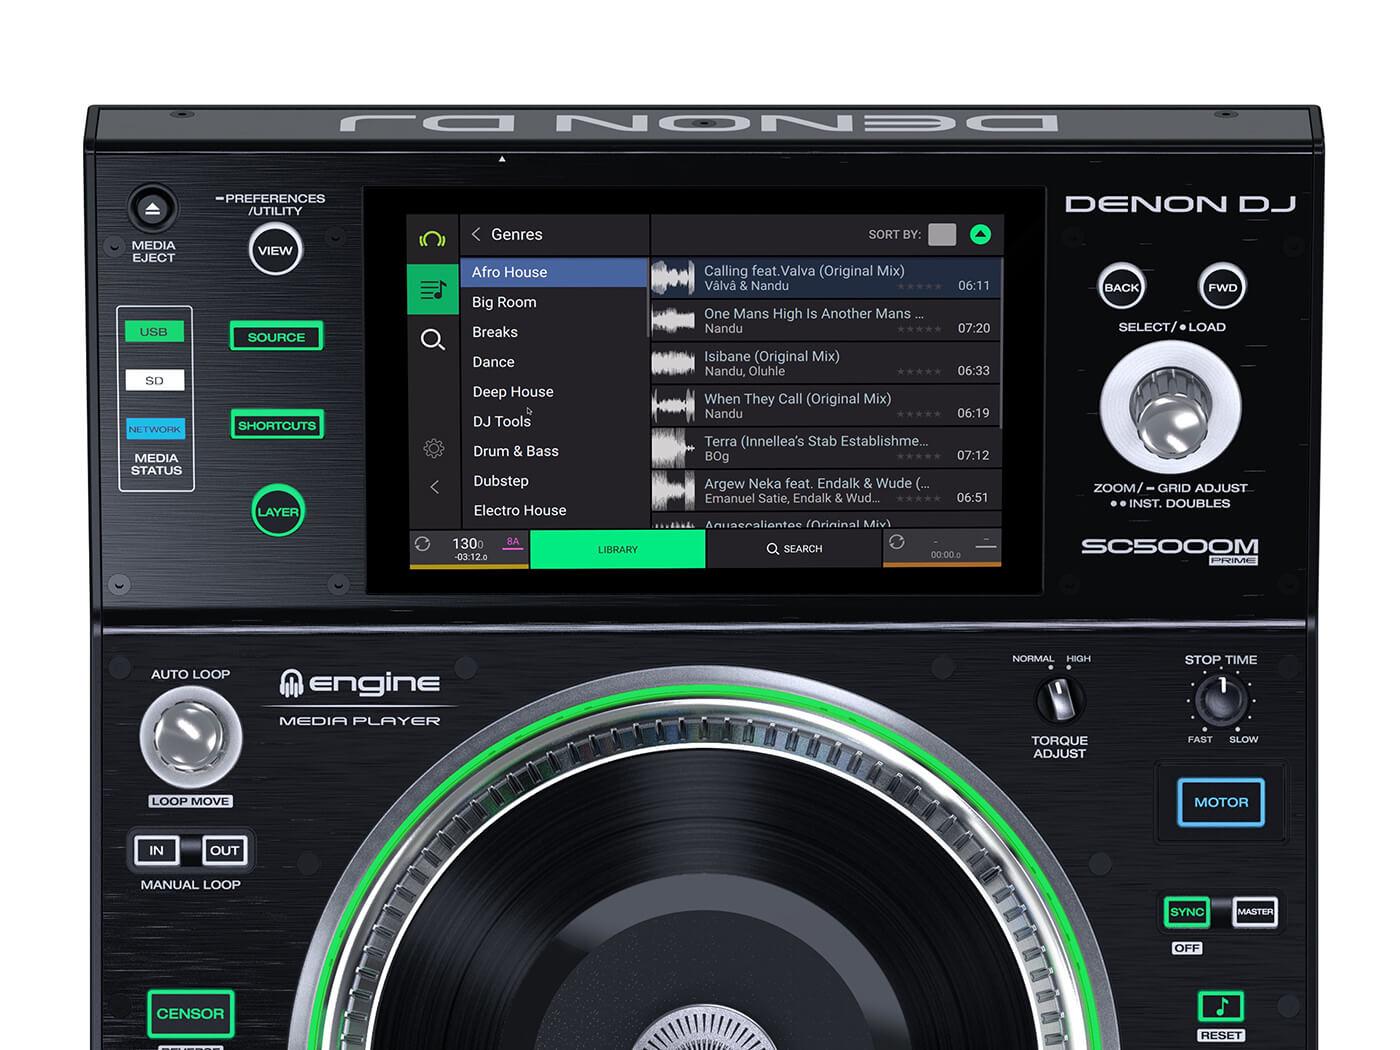 Denon DJ SC5000M display beatport link